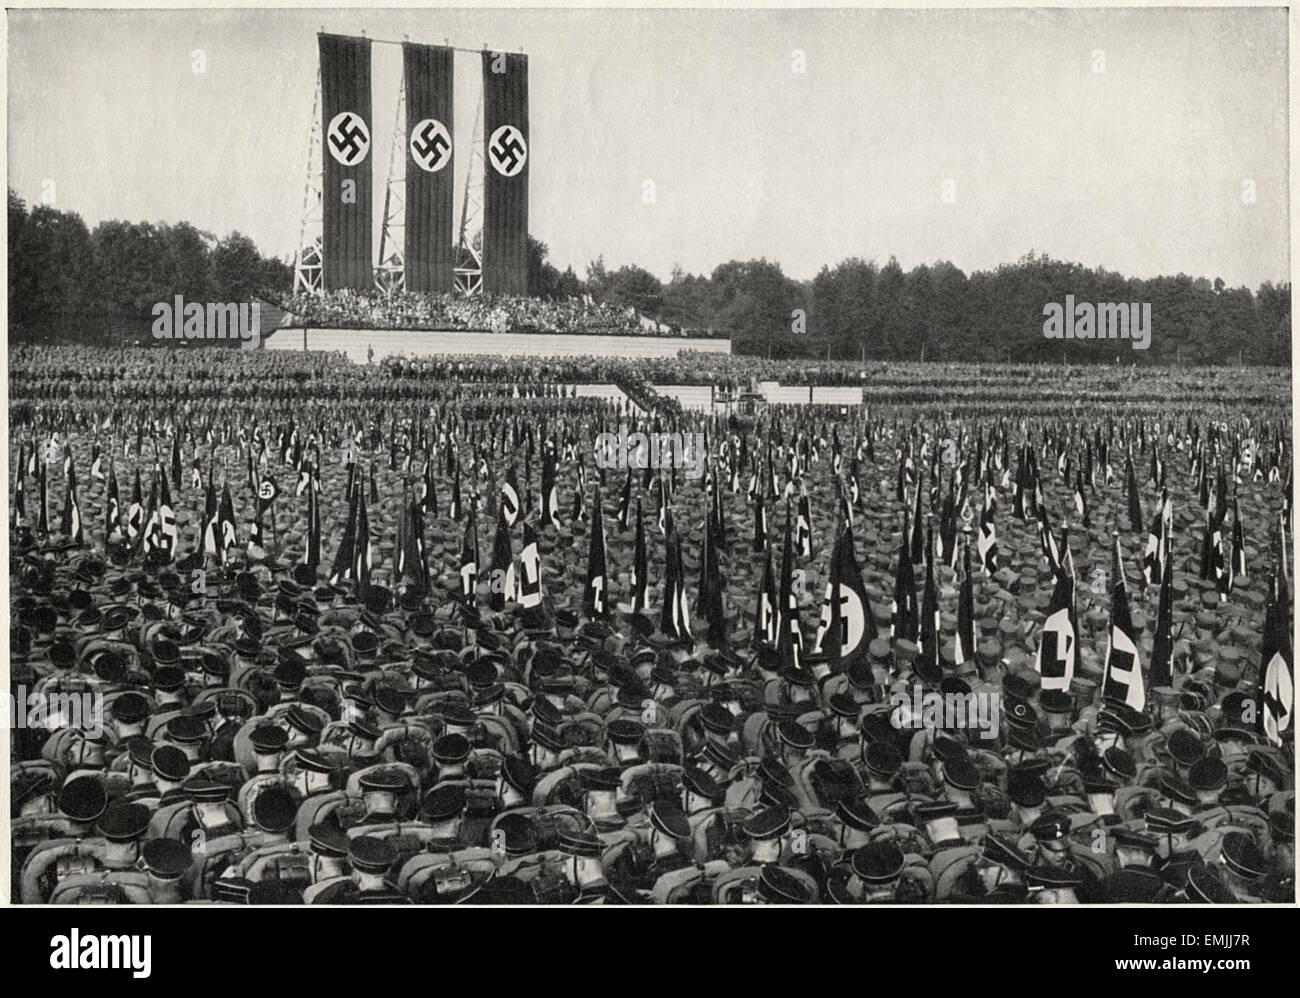 German SA Troops at Rally, Nuremberg, Germany, 1933 - Stock Image